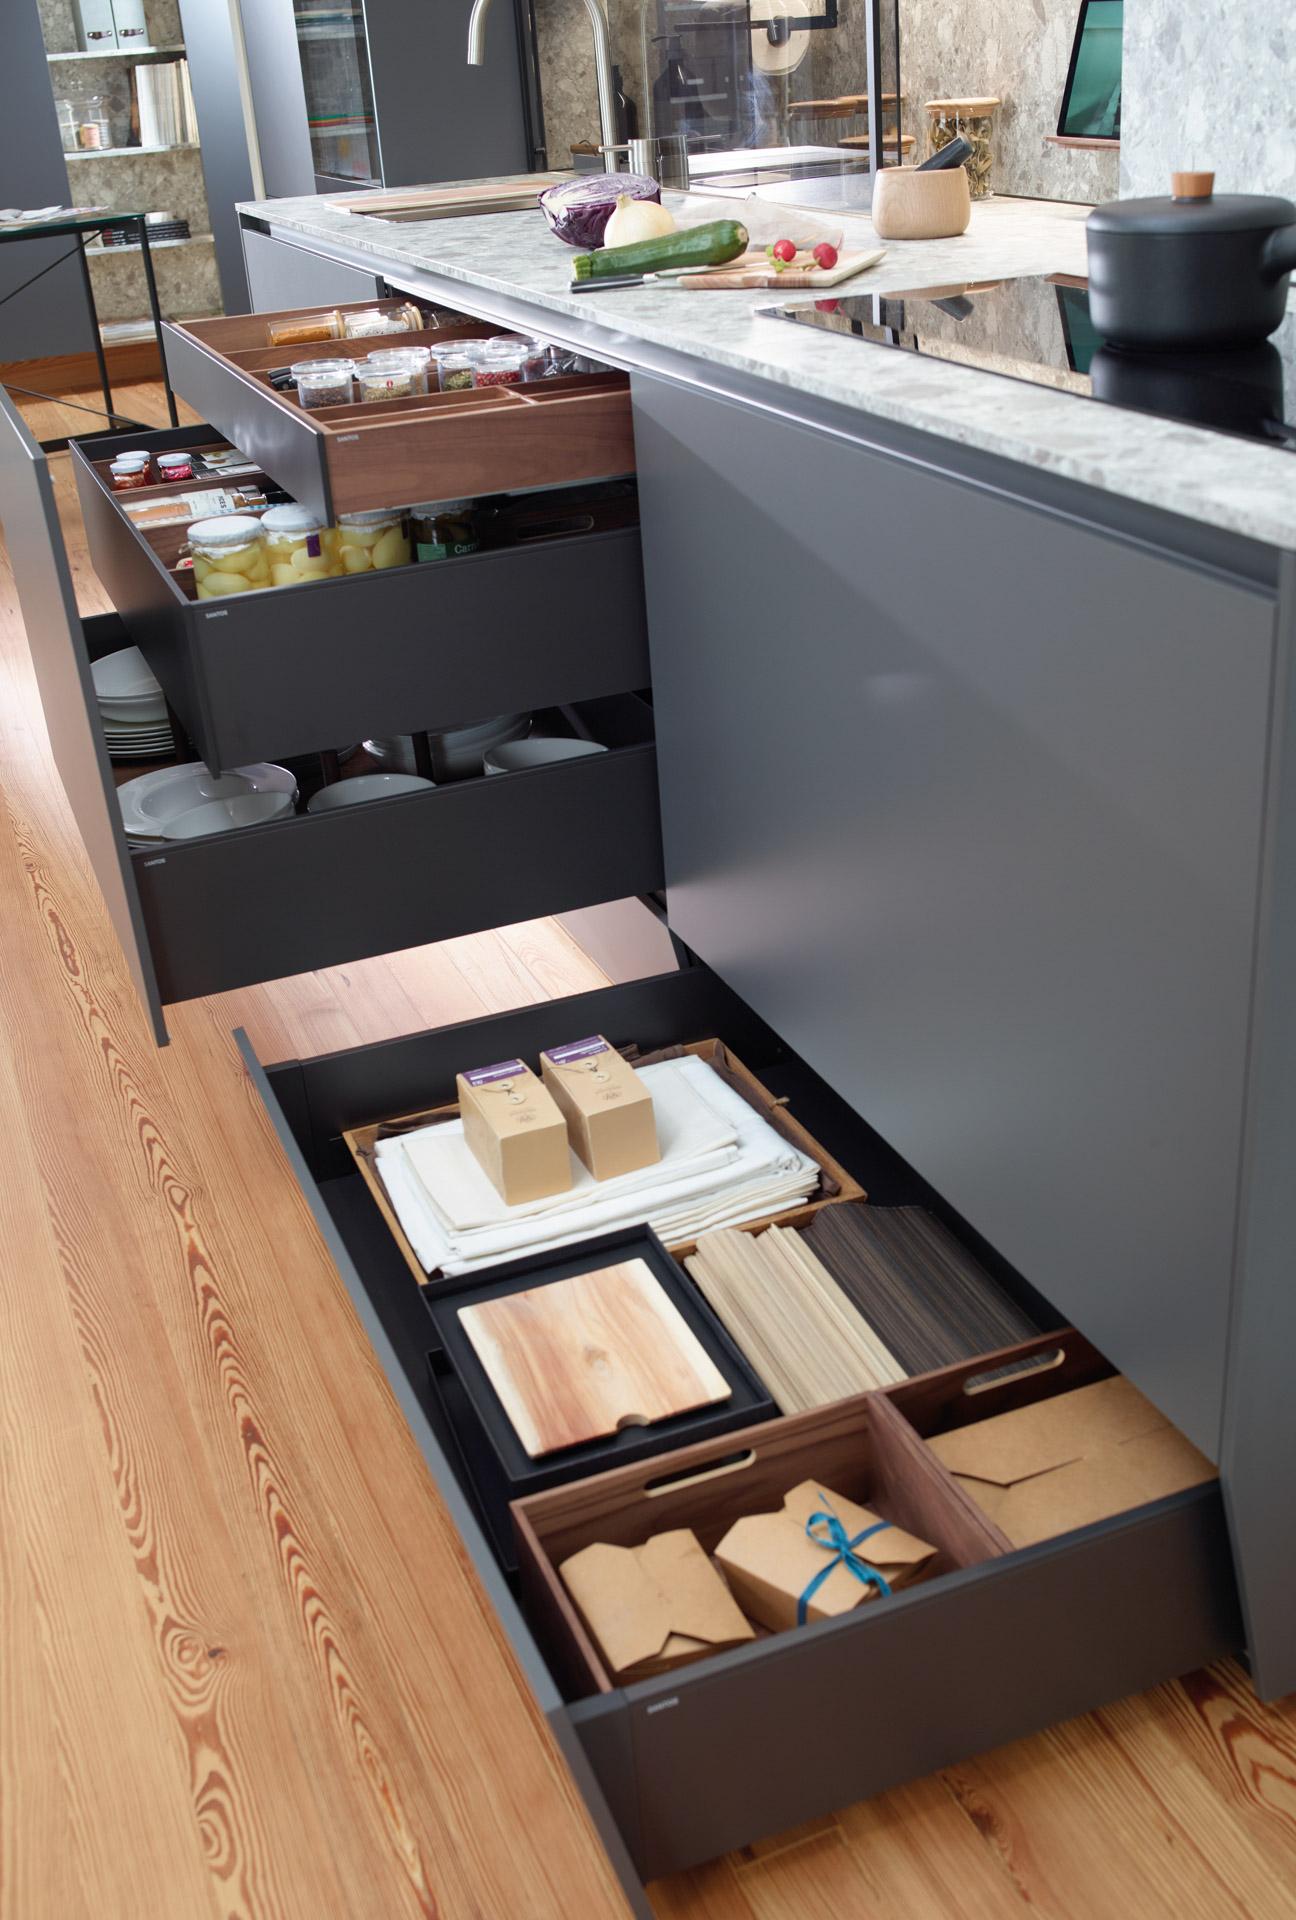 cajon-contenedor-de-almacenamiento